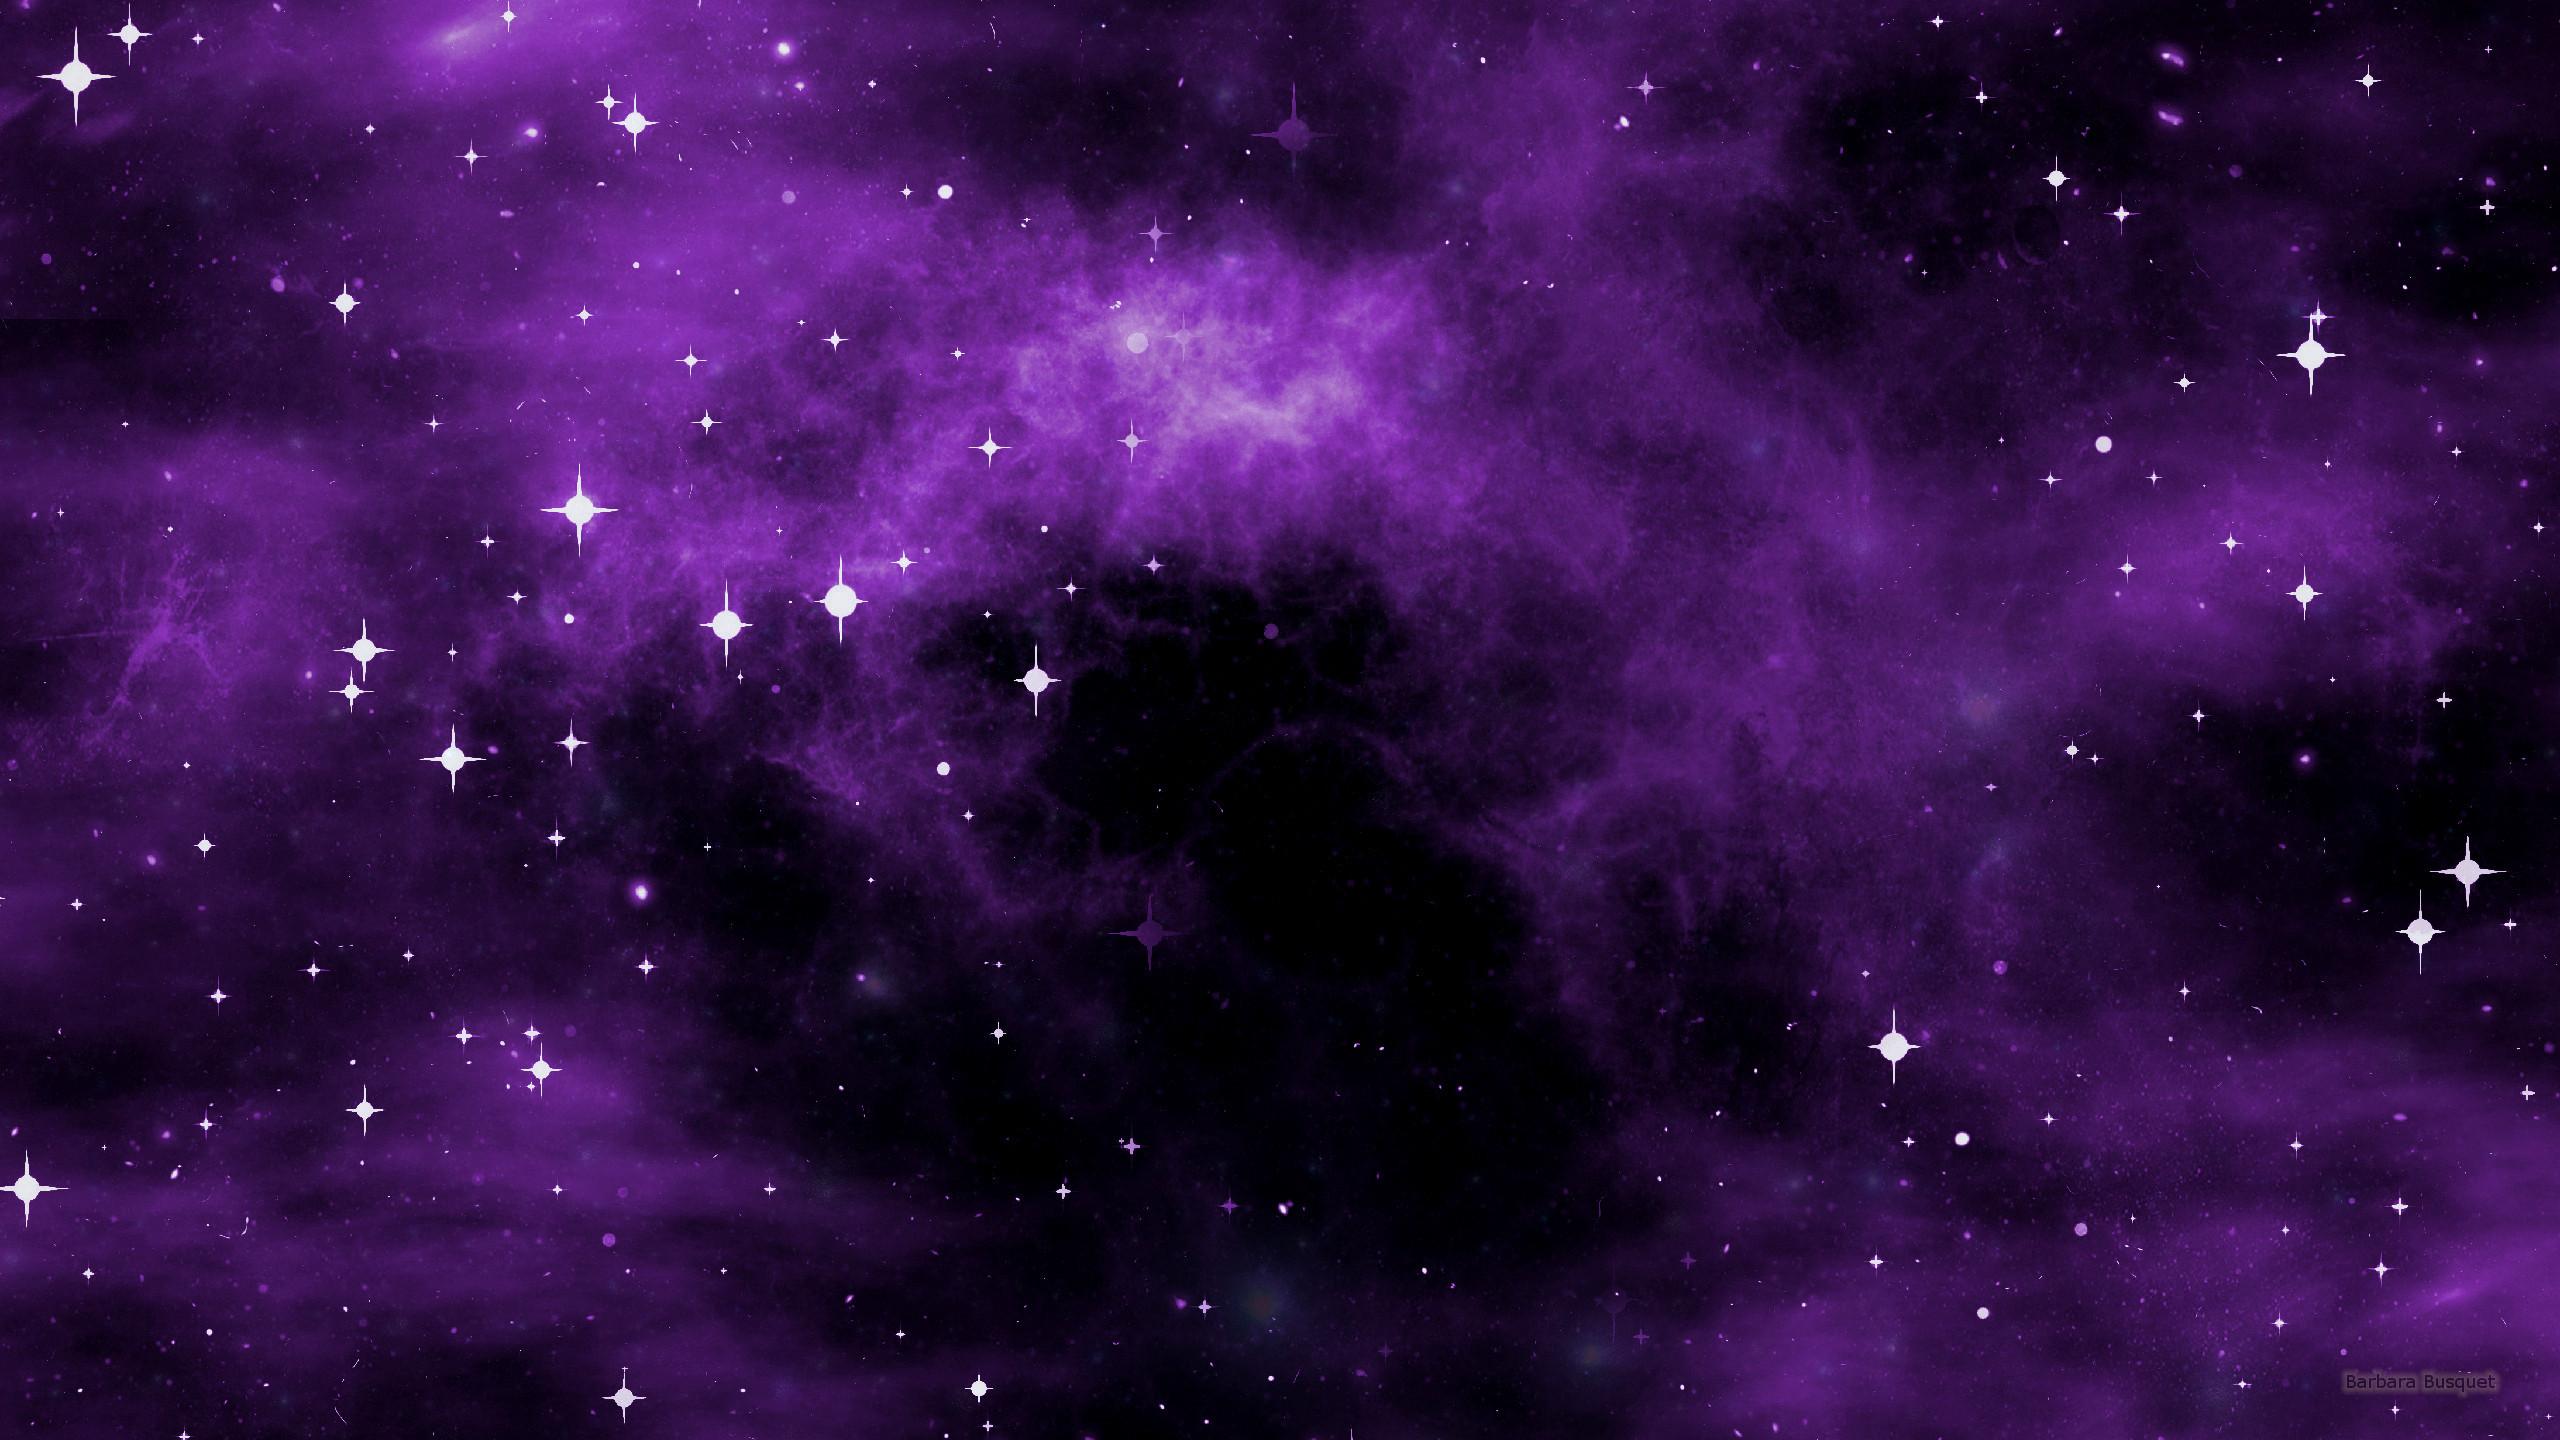 Space wallpaper with purple nebula.